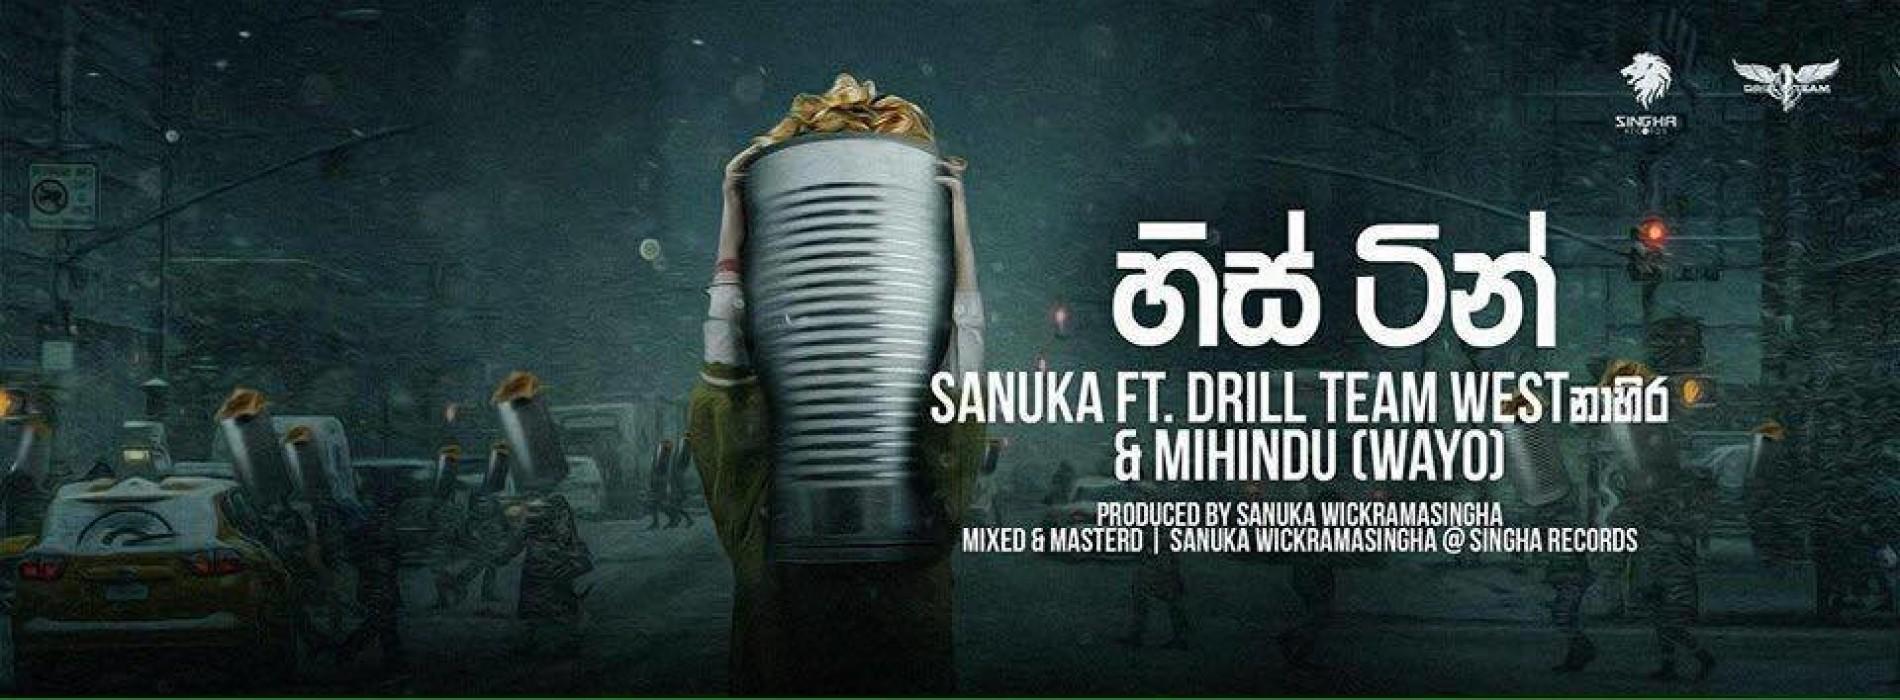 New Music By Sanuka, The Drill Team & Mihindu (Wayo)